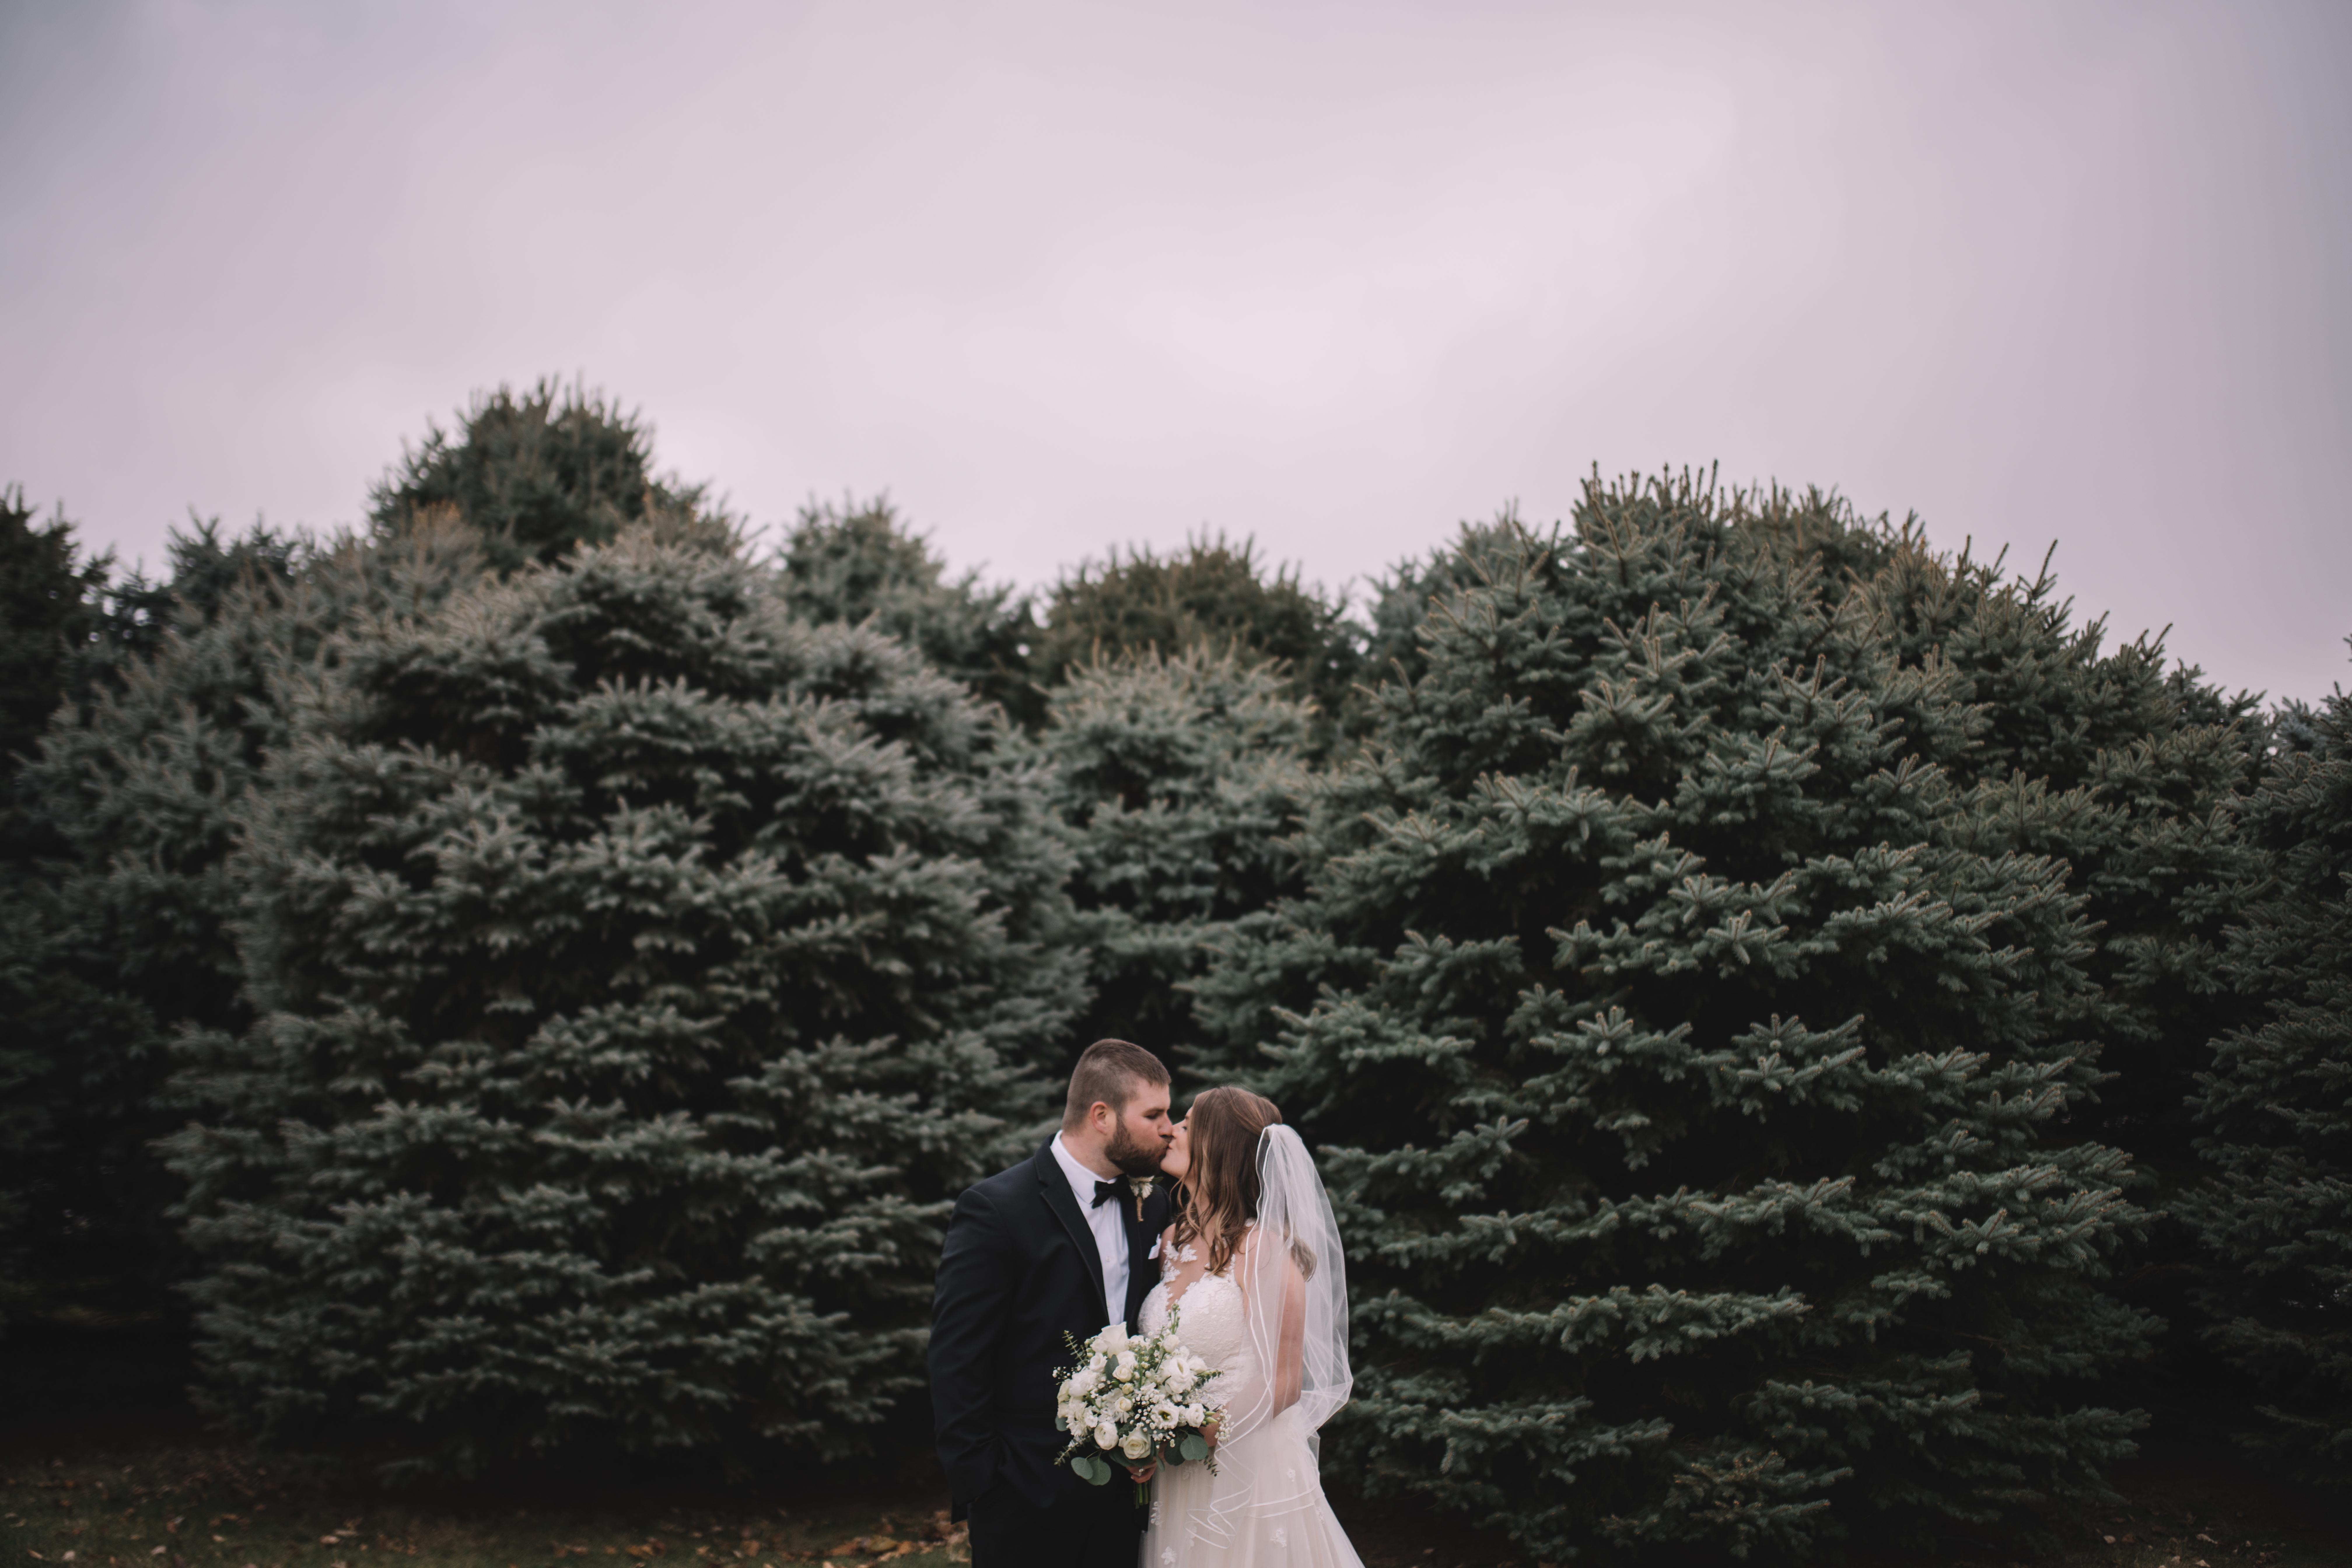 normal il wedding, bloomington il wedding, bloomington wedding photographer, bloomington wedding, bl